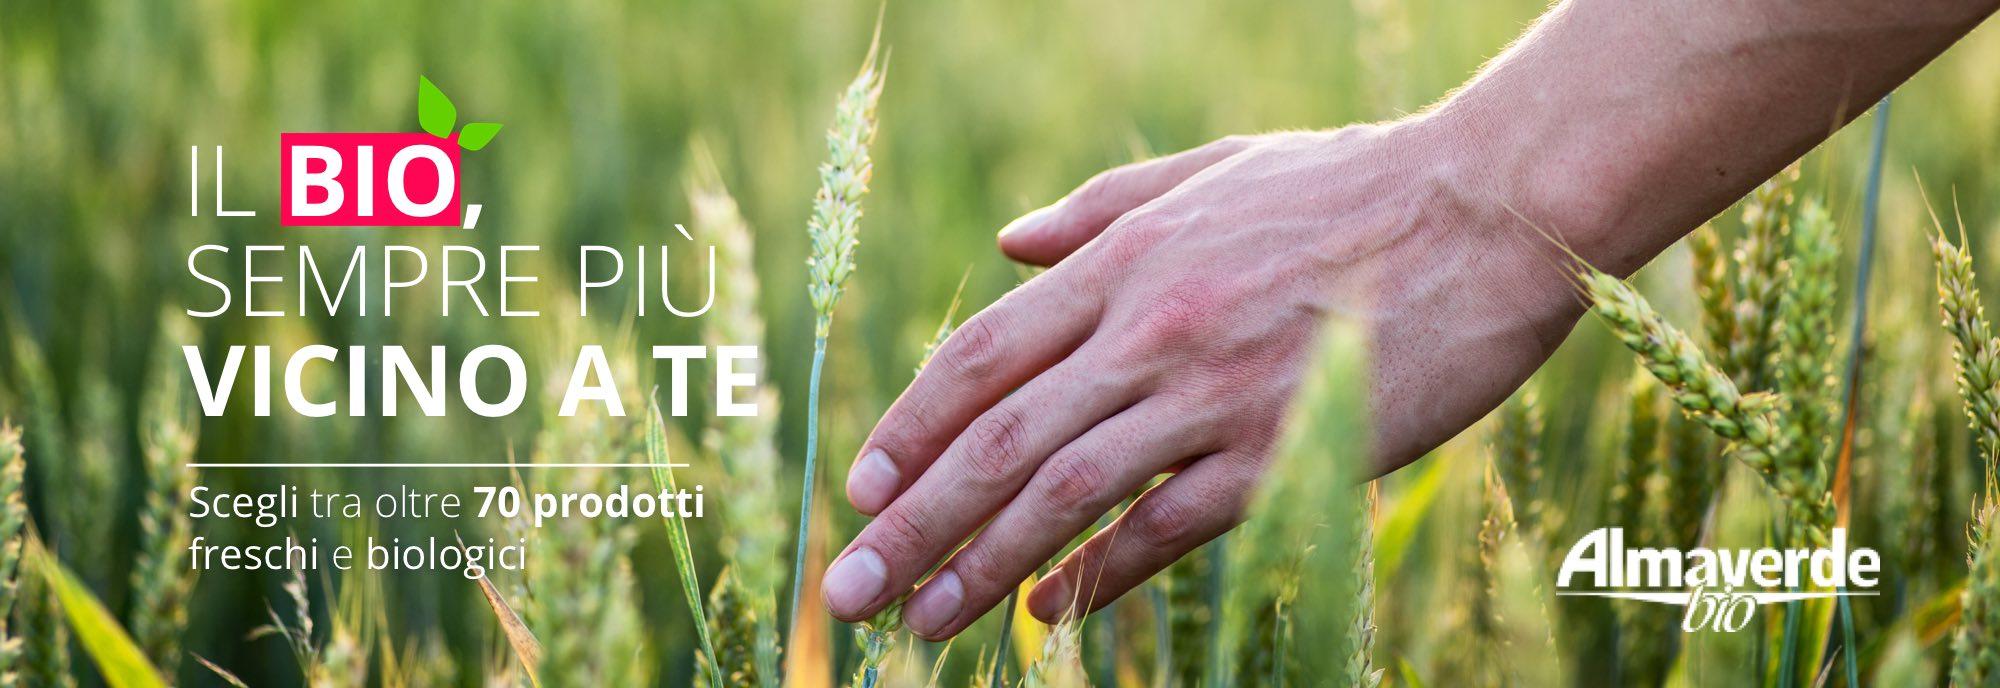 Acquista Online più di 70 varietà di frutta e verdura su FruttaWeb.com